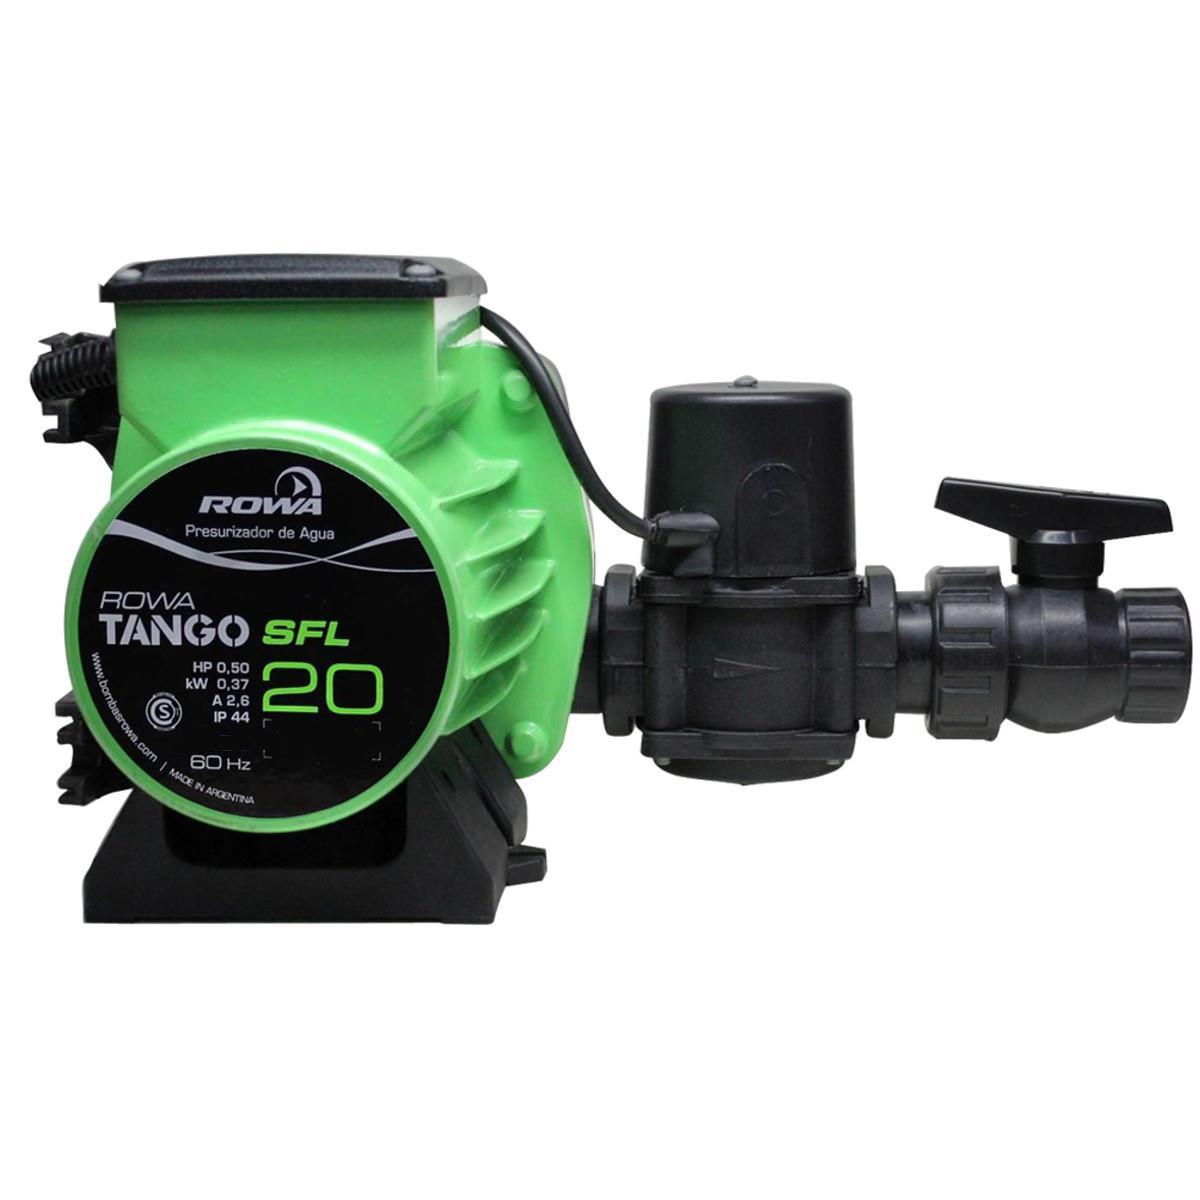 Bomba pressurizadora Tango SFL 20 Rowa 19 m.c.a. 220V